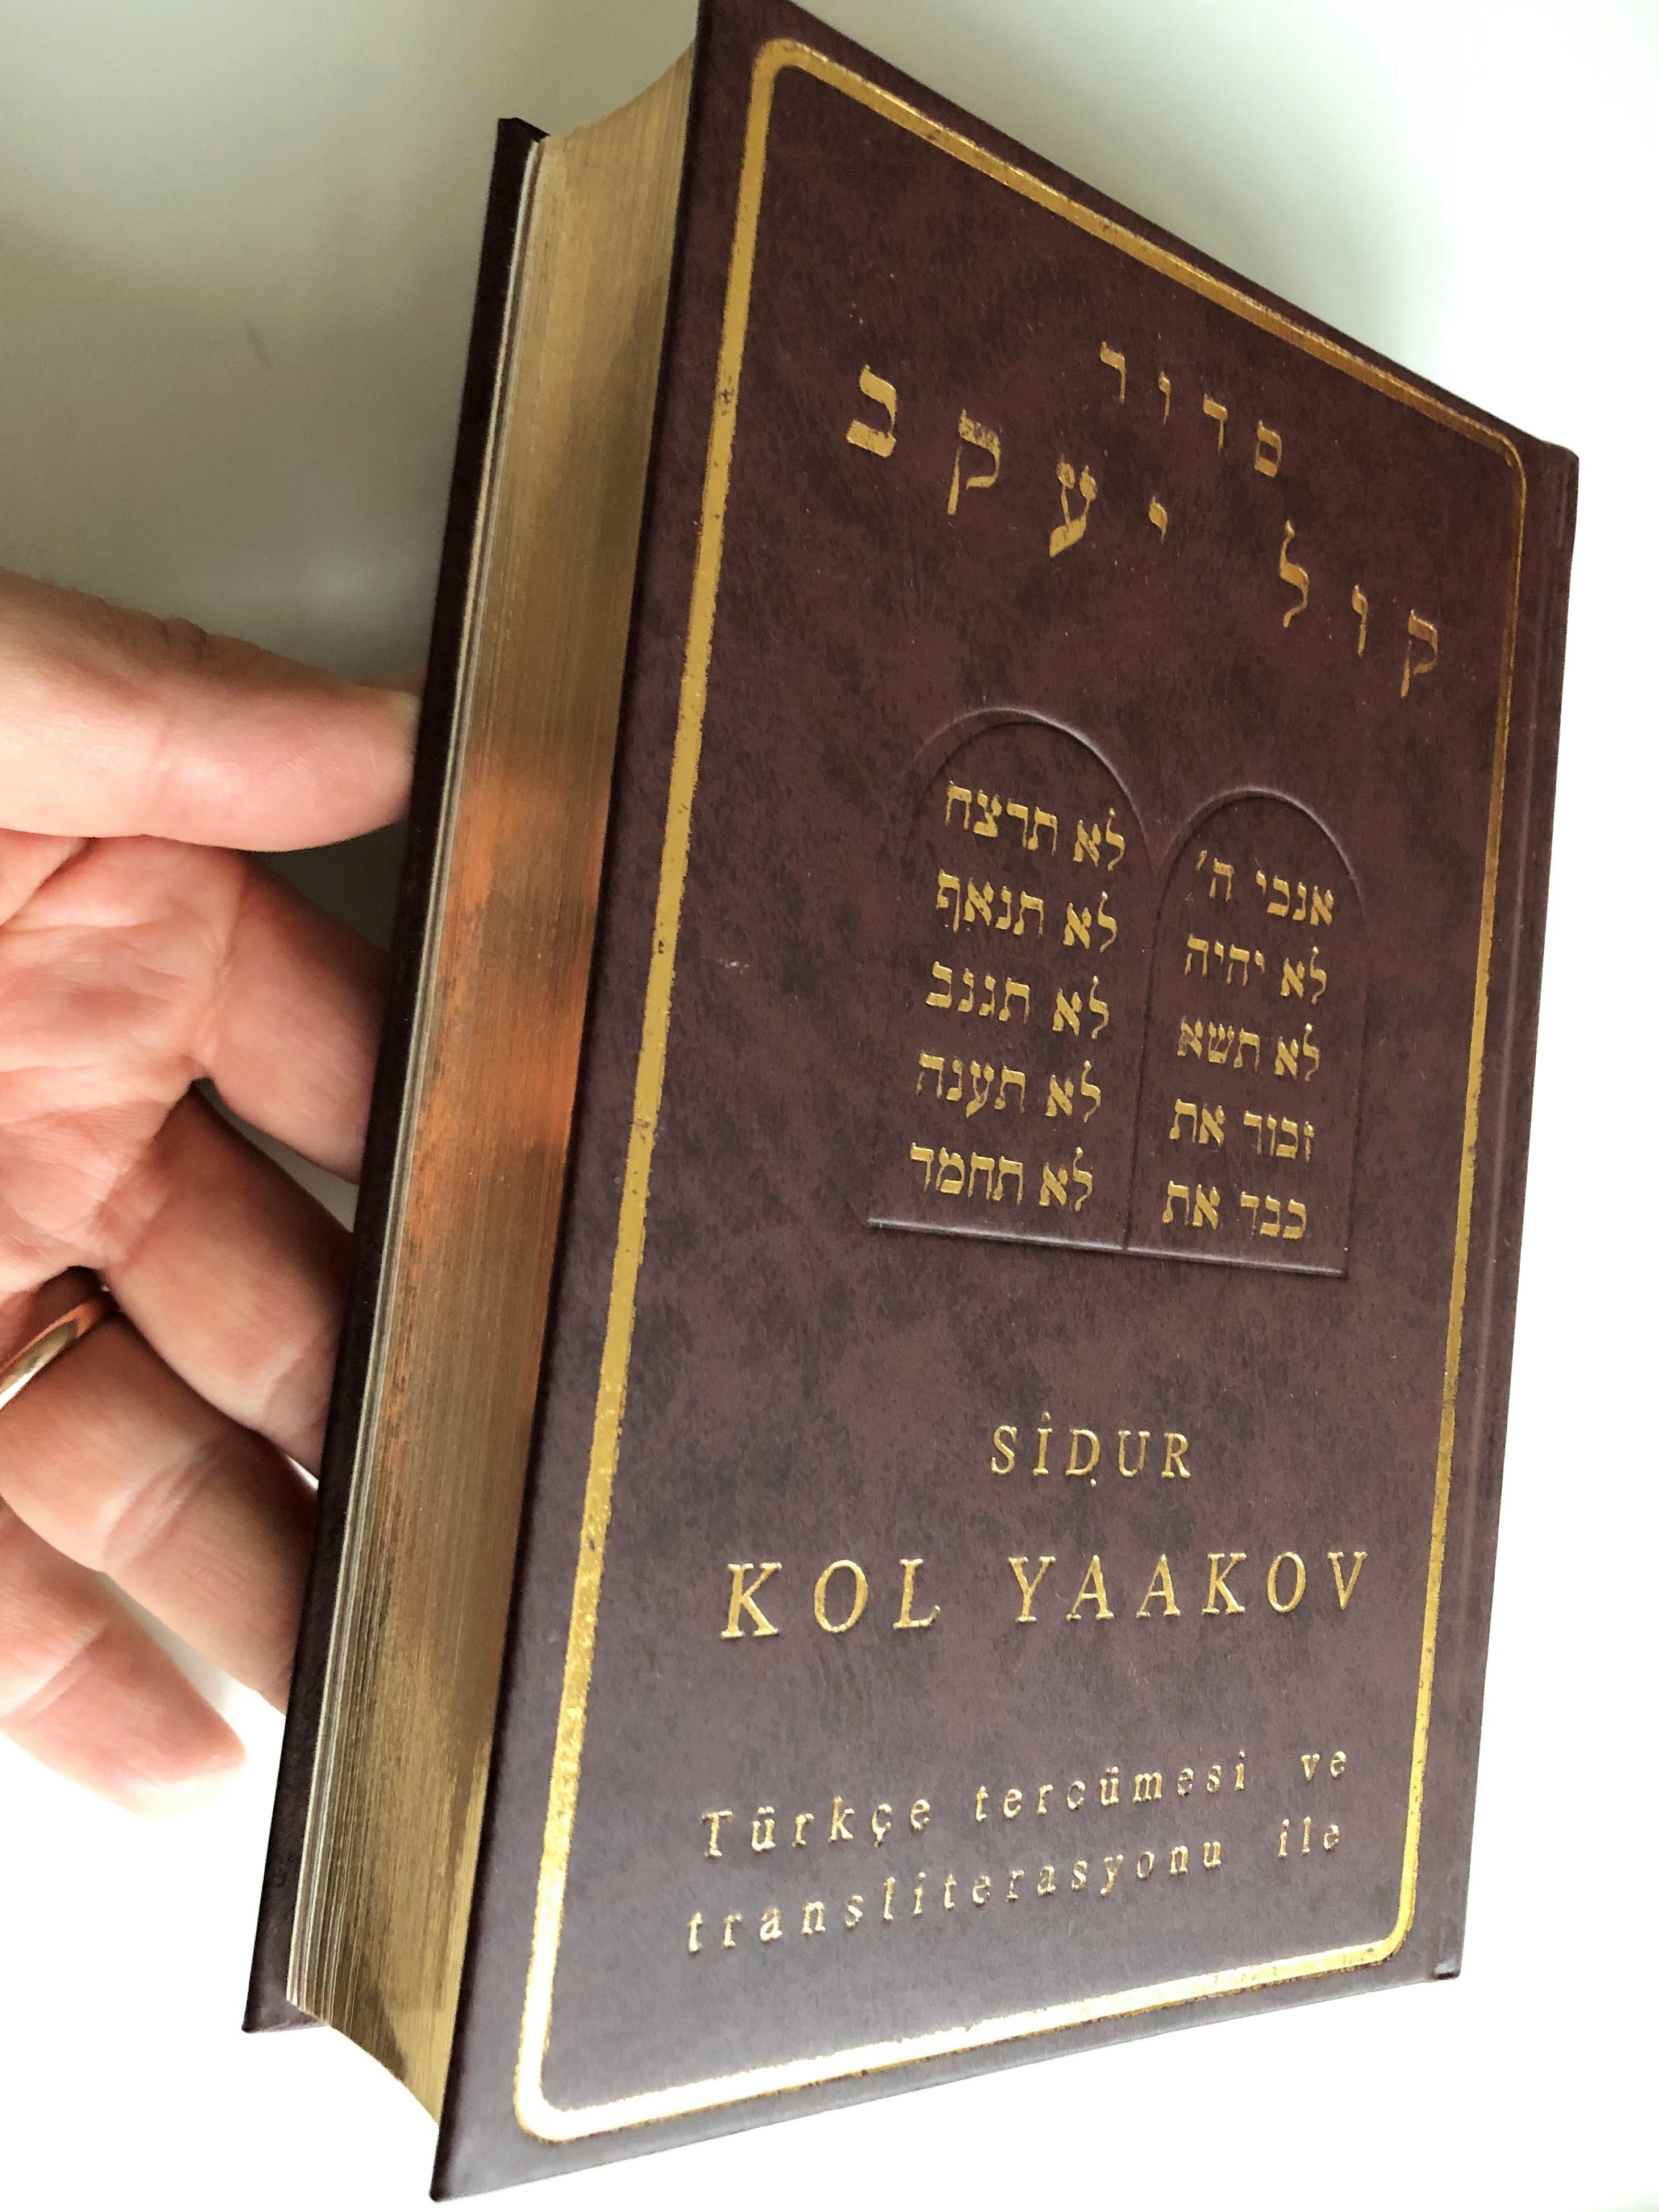 sidur-kol-yaakov-hebrew-turkish-bilingual-prayer-book-lilane-zerbib-kazes-golden-edges-hardcover-2013-3-.jpg